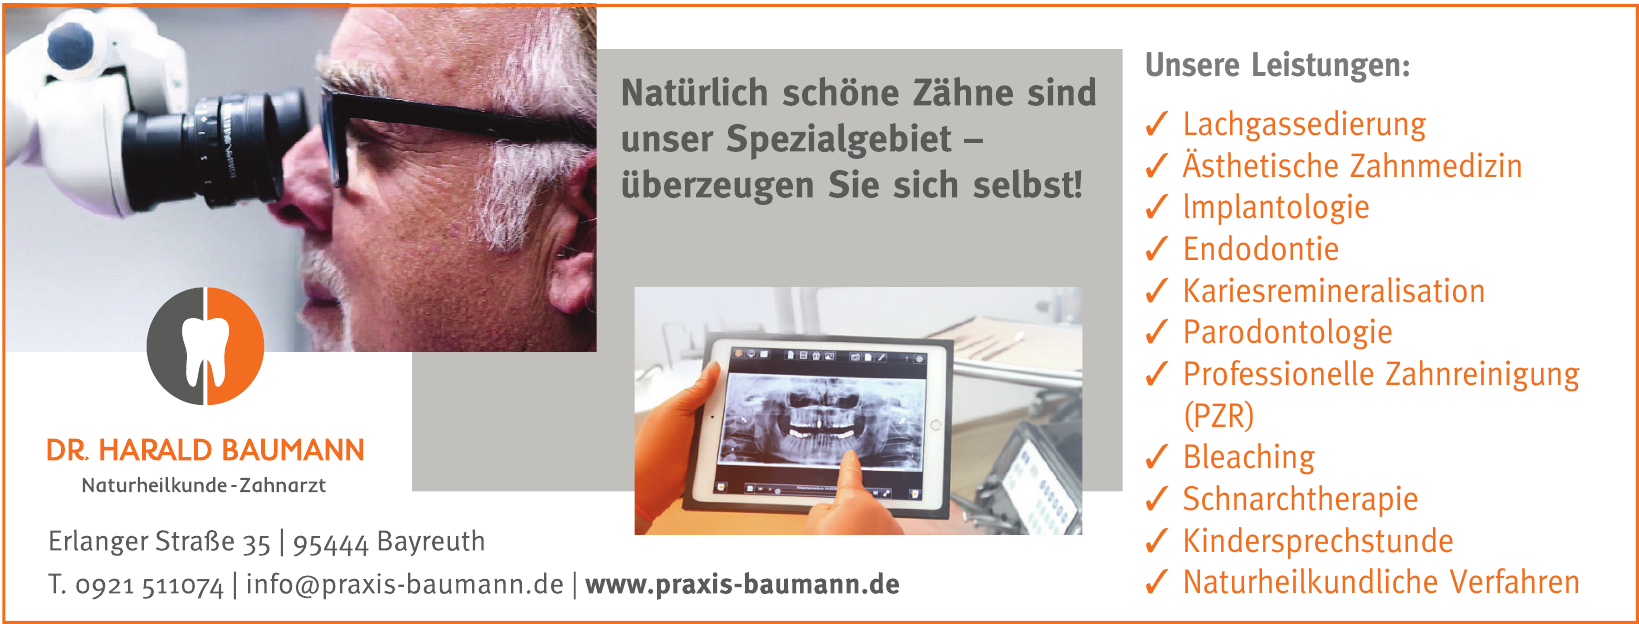 Dr. Harald Baumann